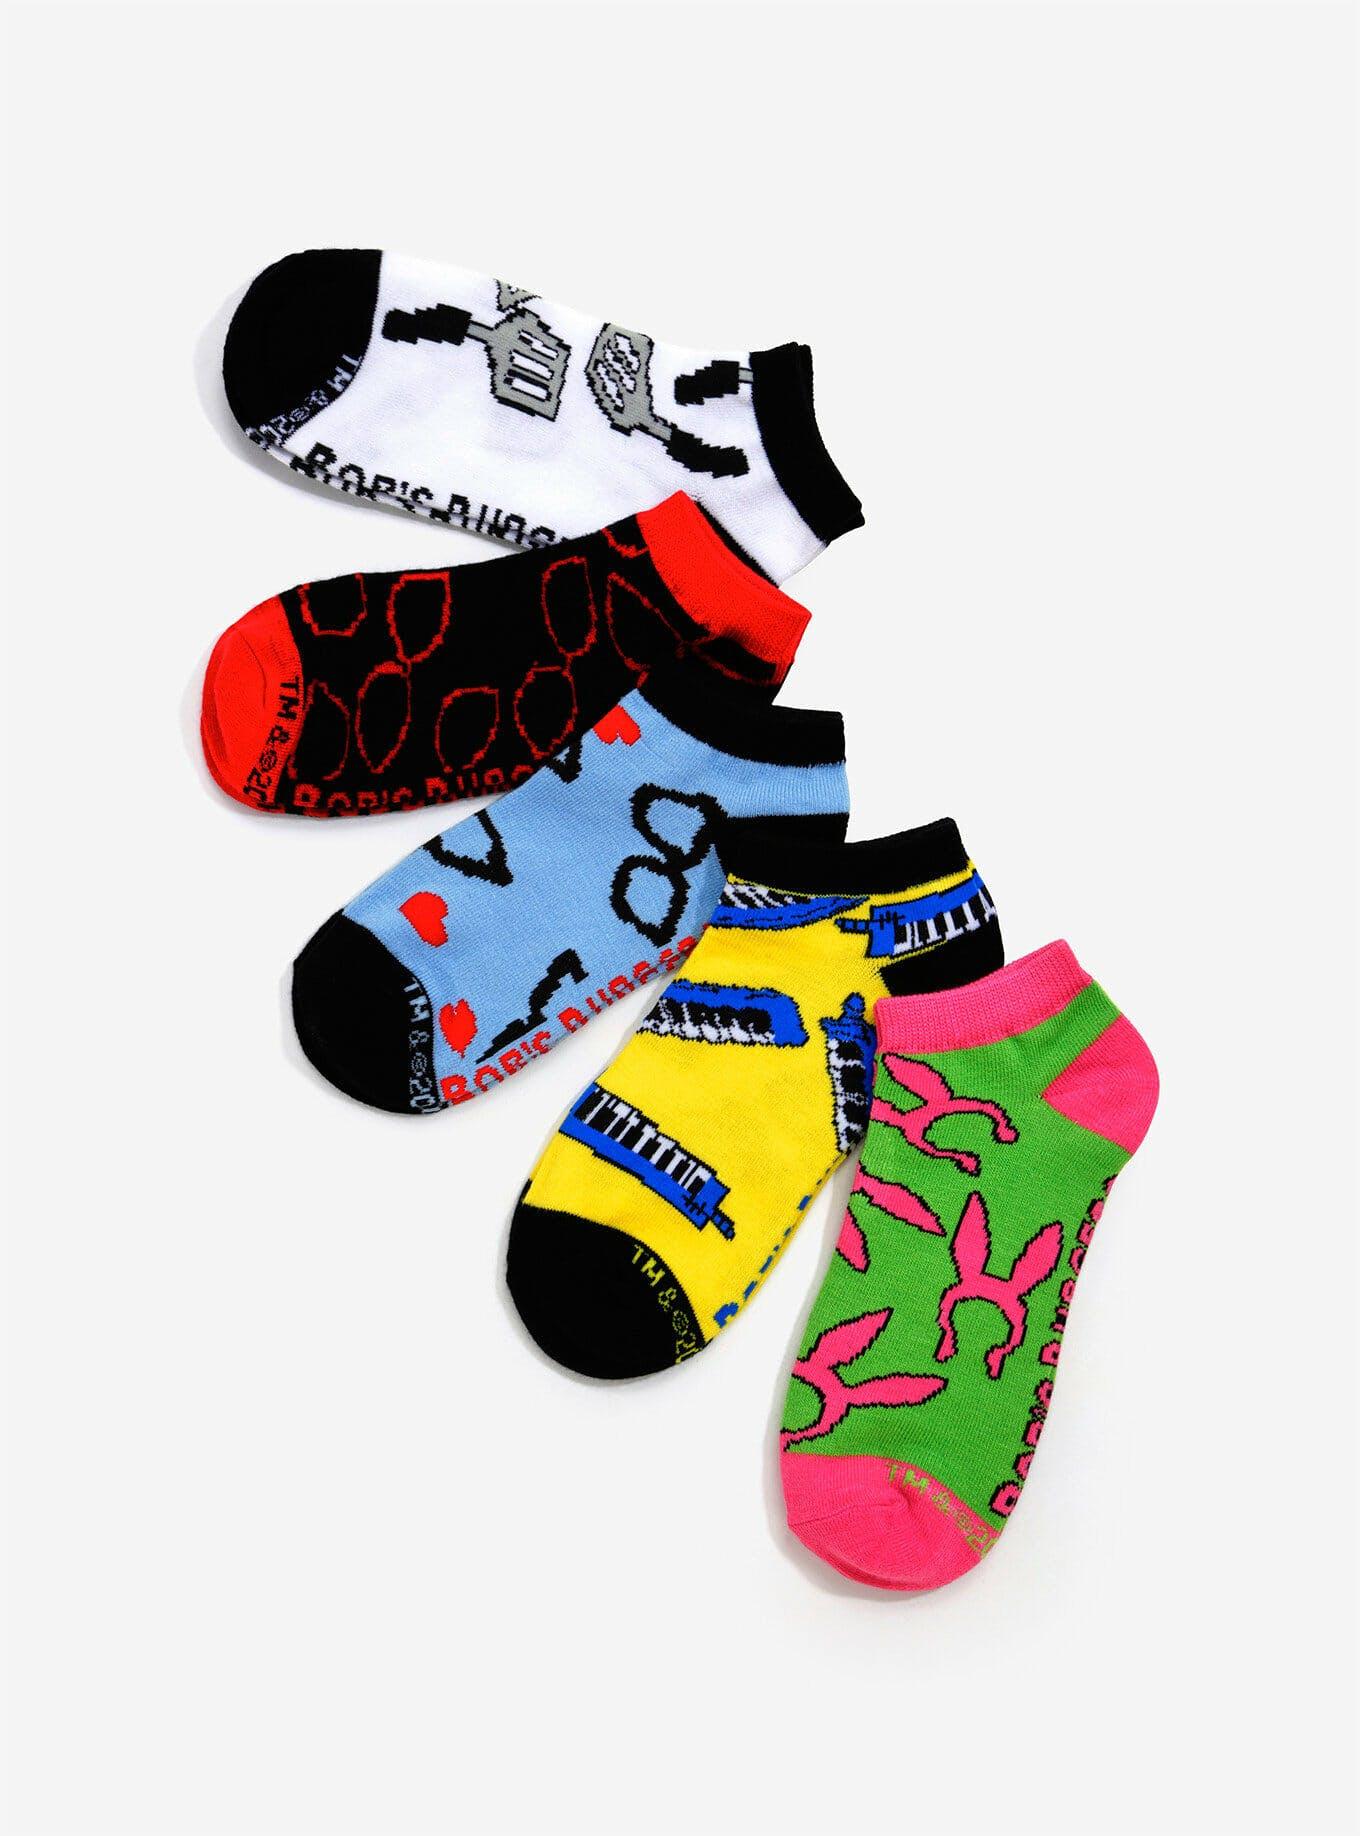 bob's burgers socks